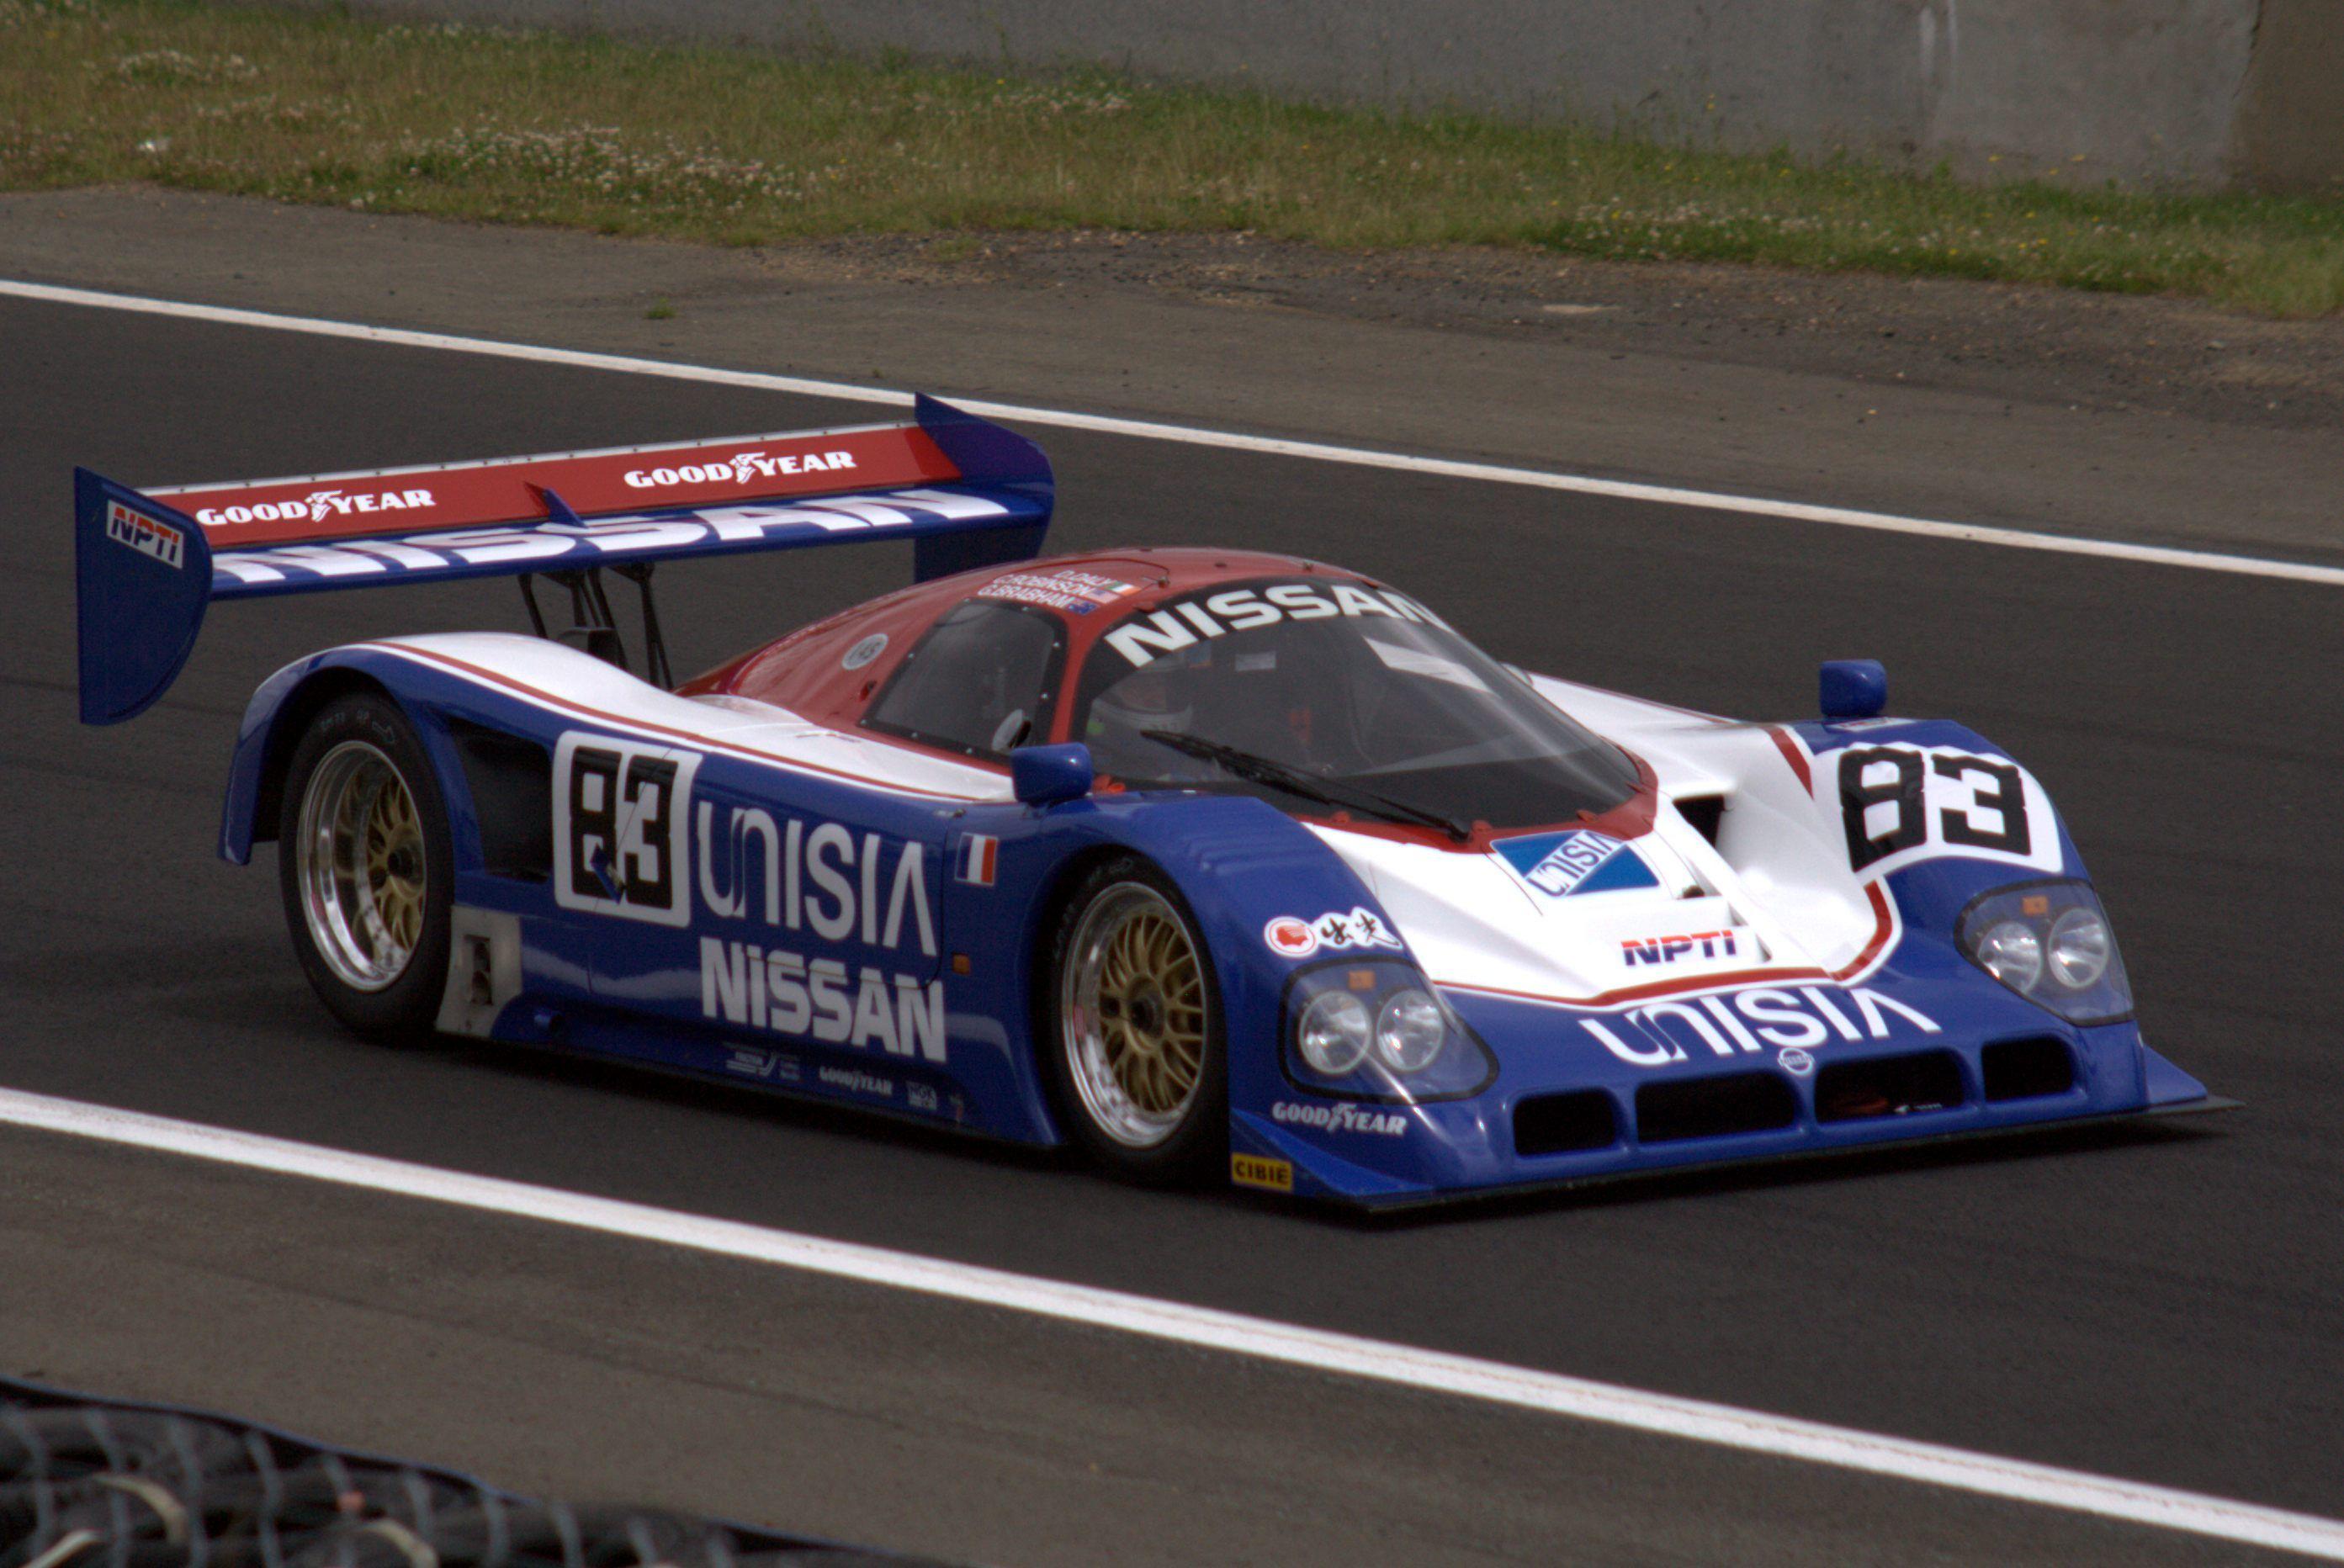 Nissan r89  Hada Googlom  motorsport  Pinterest  Nissan